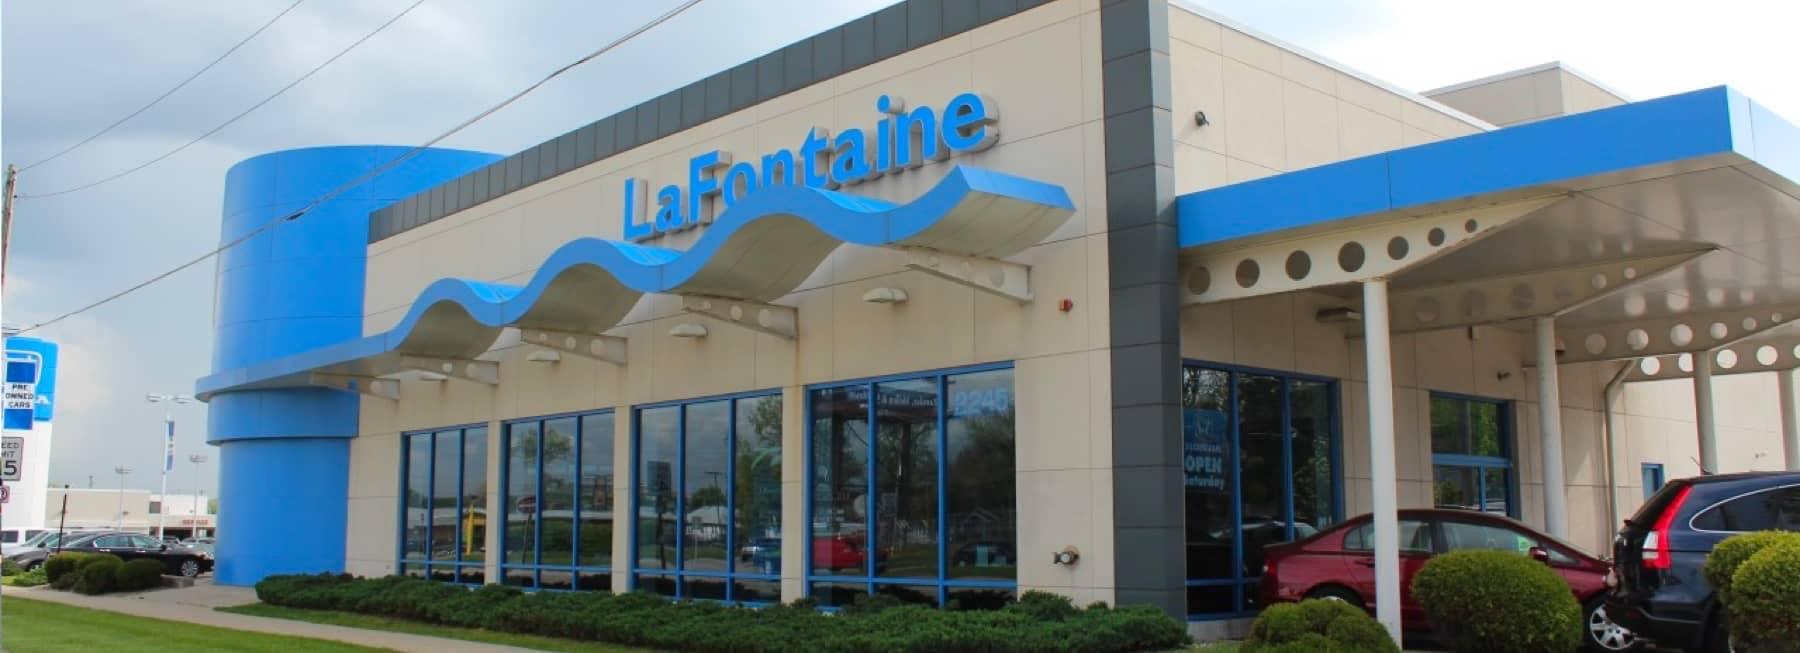 LaFontaine Honda dealership exterior